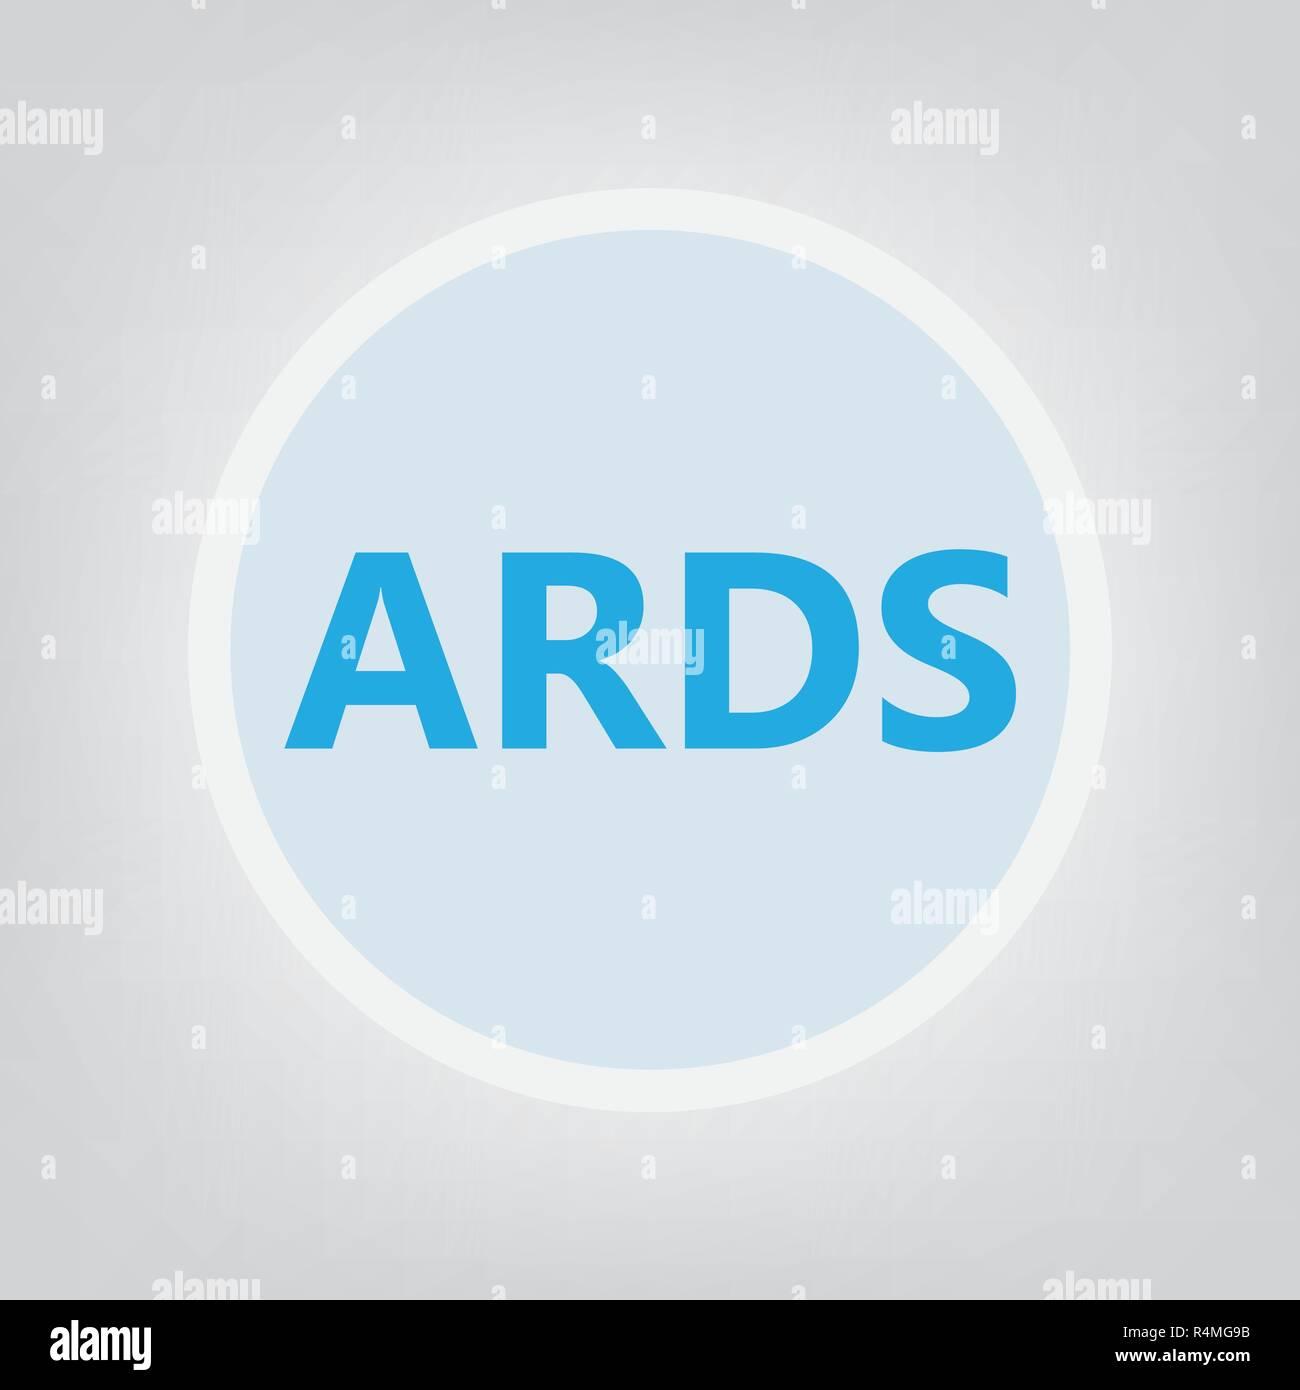 ARDS (Acute Respiratory Distress Syndrome) acronym- vector illustration - Stock Vector